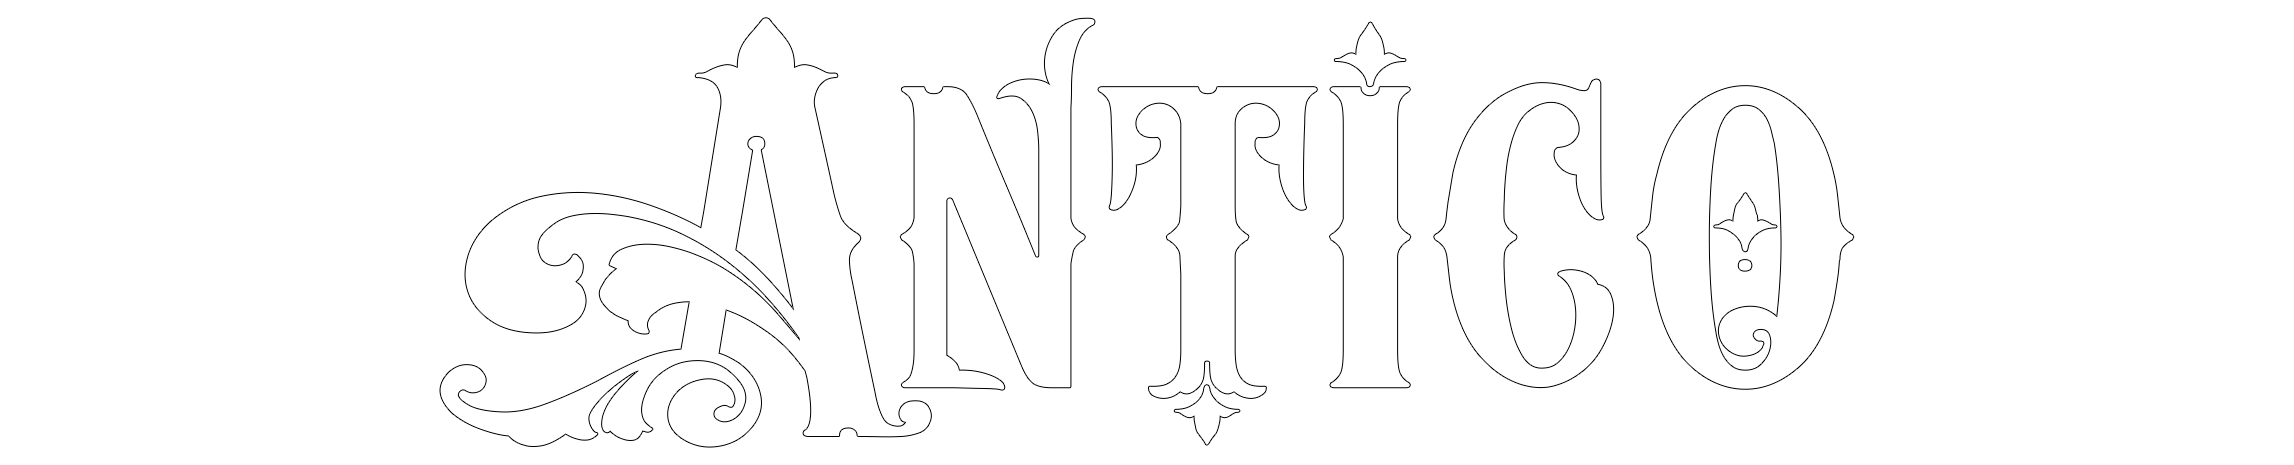 Интернет-магазин стройматериалов Antico